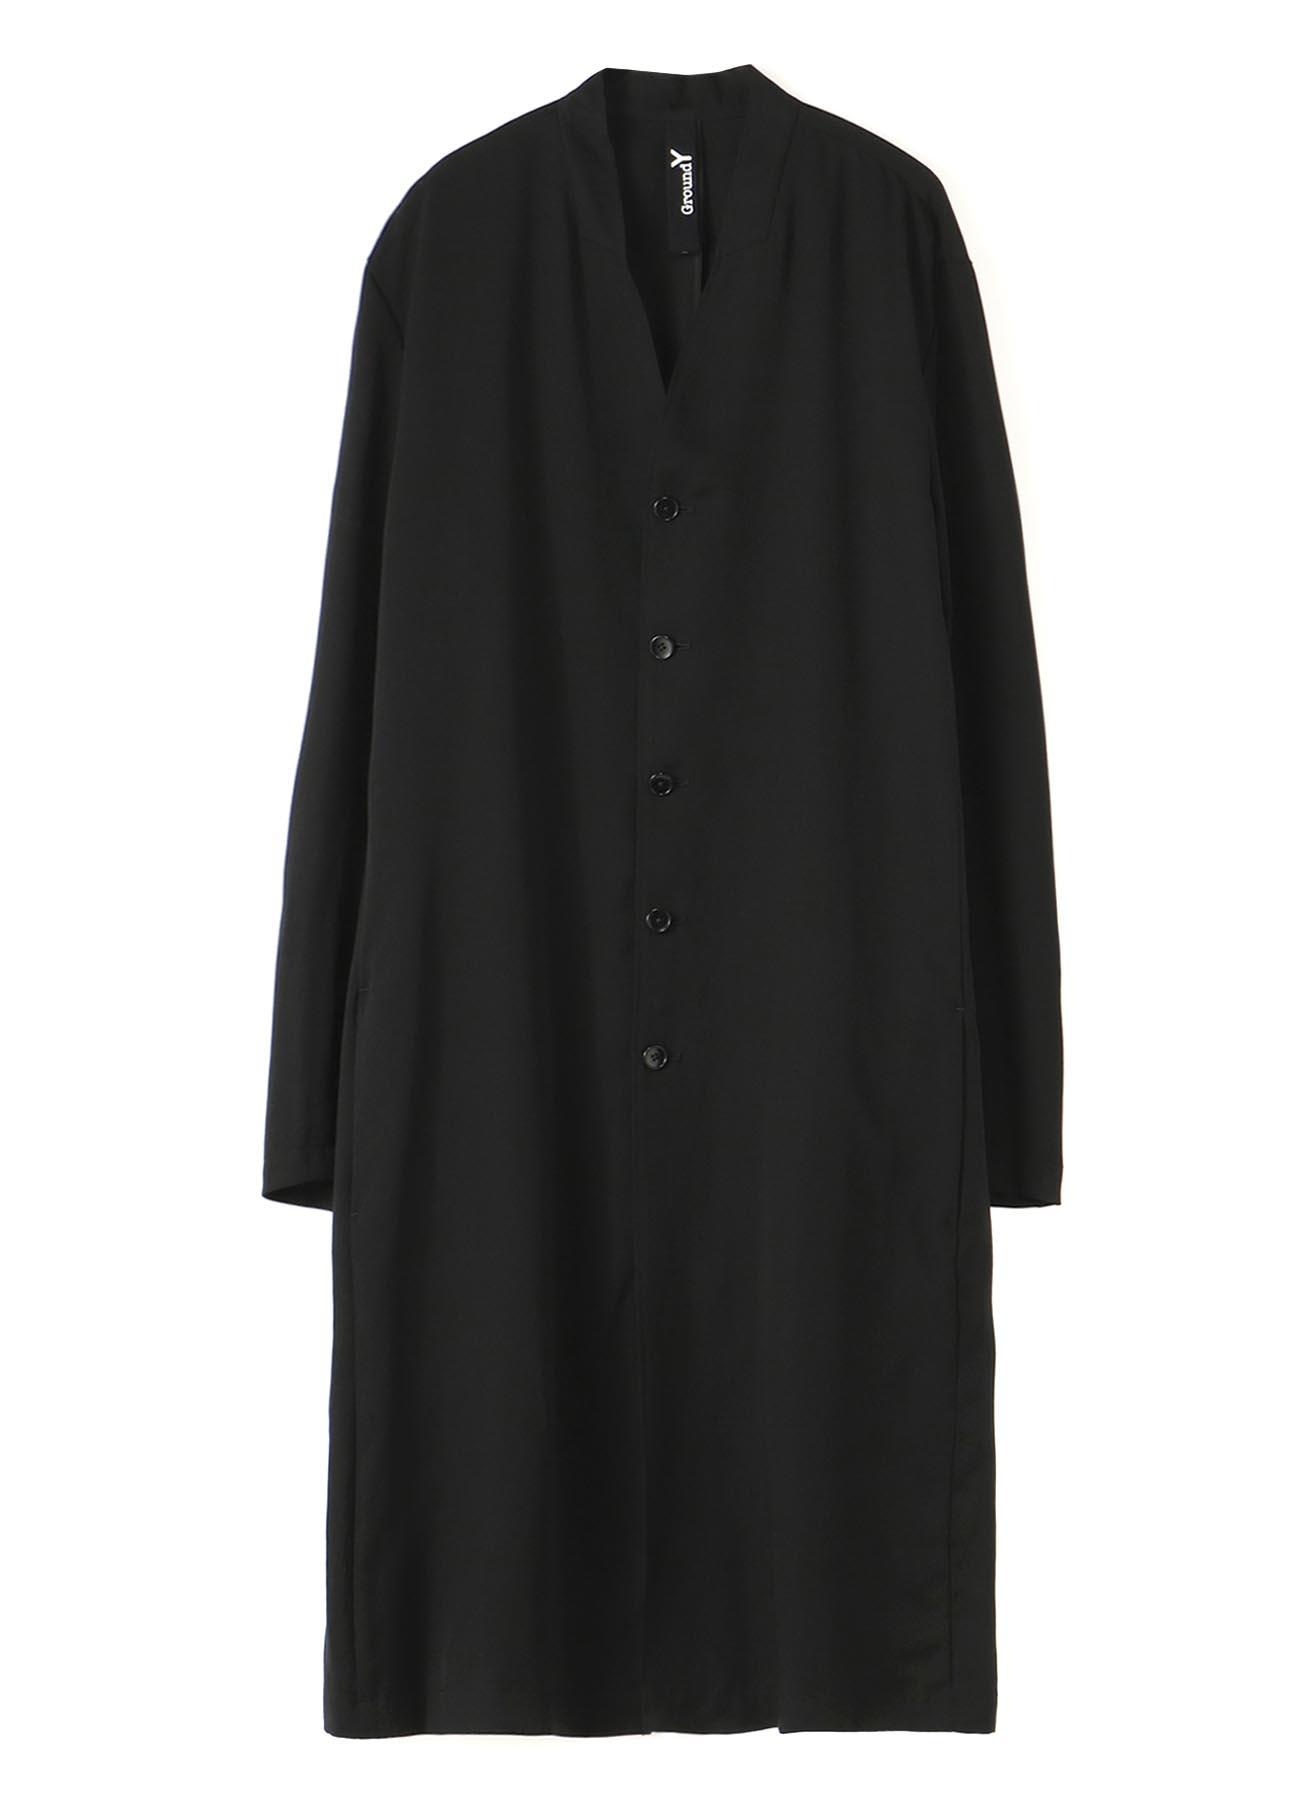 TE/Burberry No Collar Long Cardigan